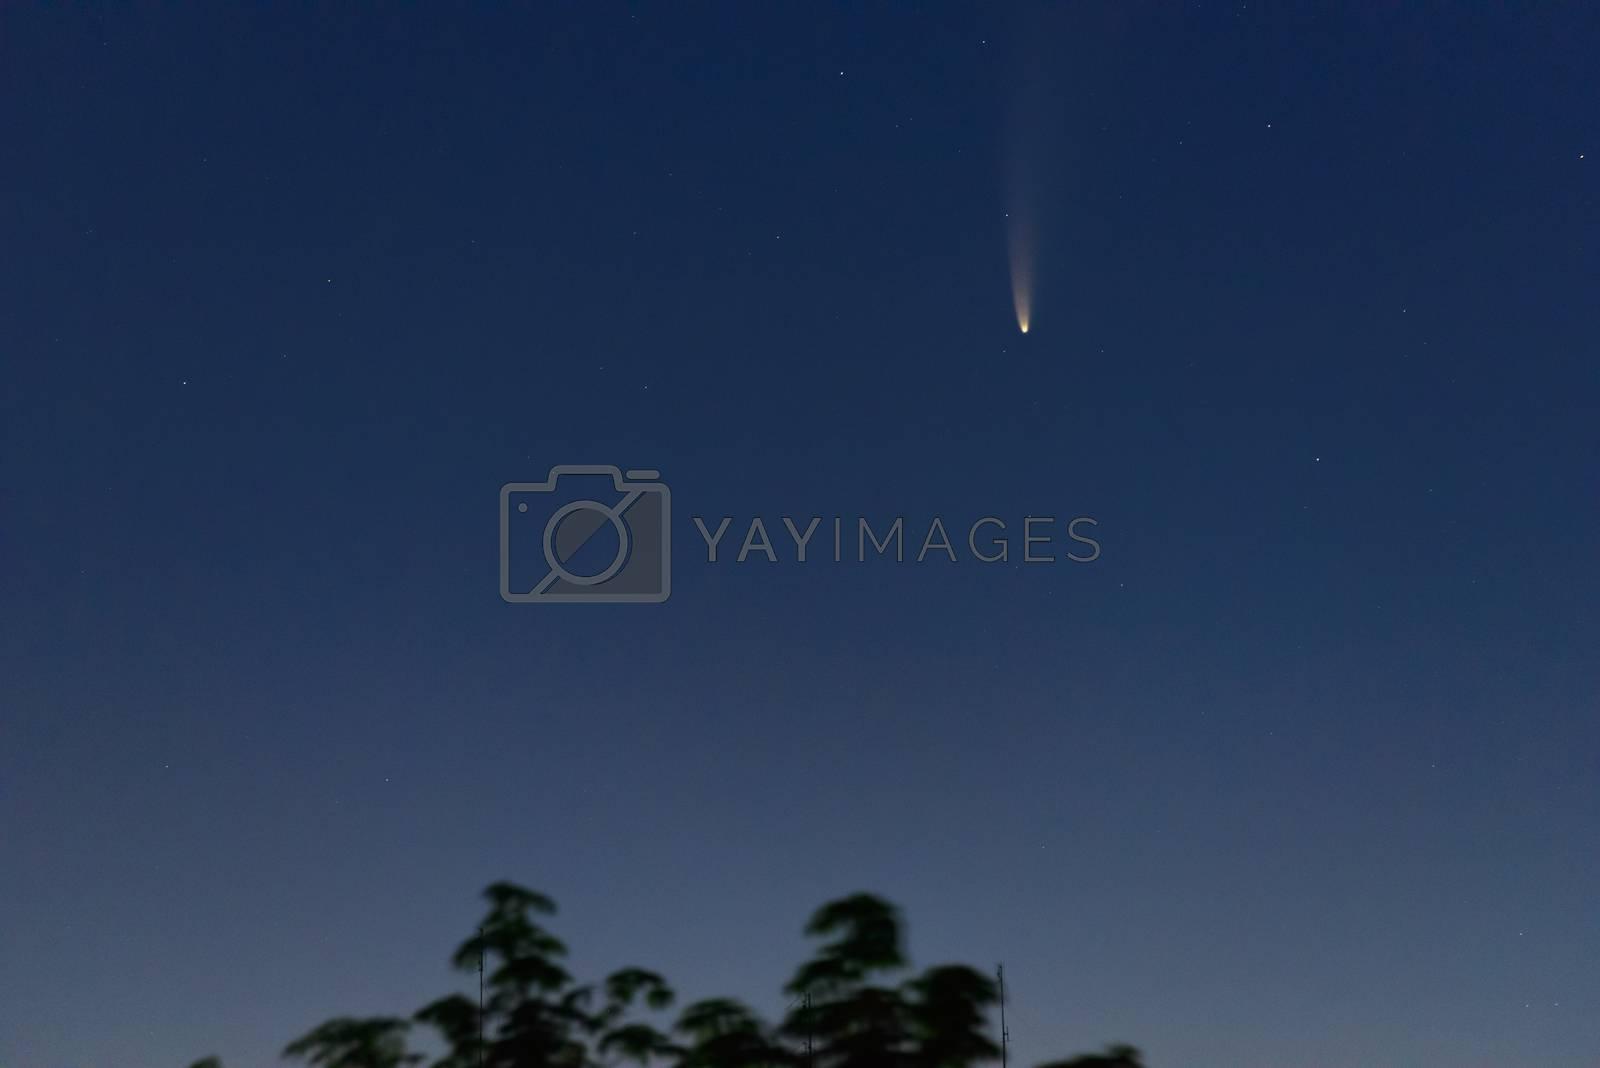 Comet C/2020 F3 (NEOWISE) in early morning sky over tree, Zaporizhzhia, Ukraine, 12 July 2020. Credit: Maksym Protsenko/Alamy